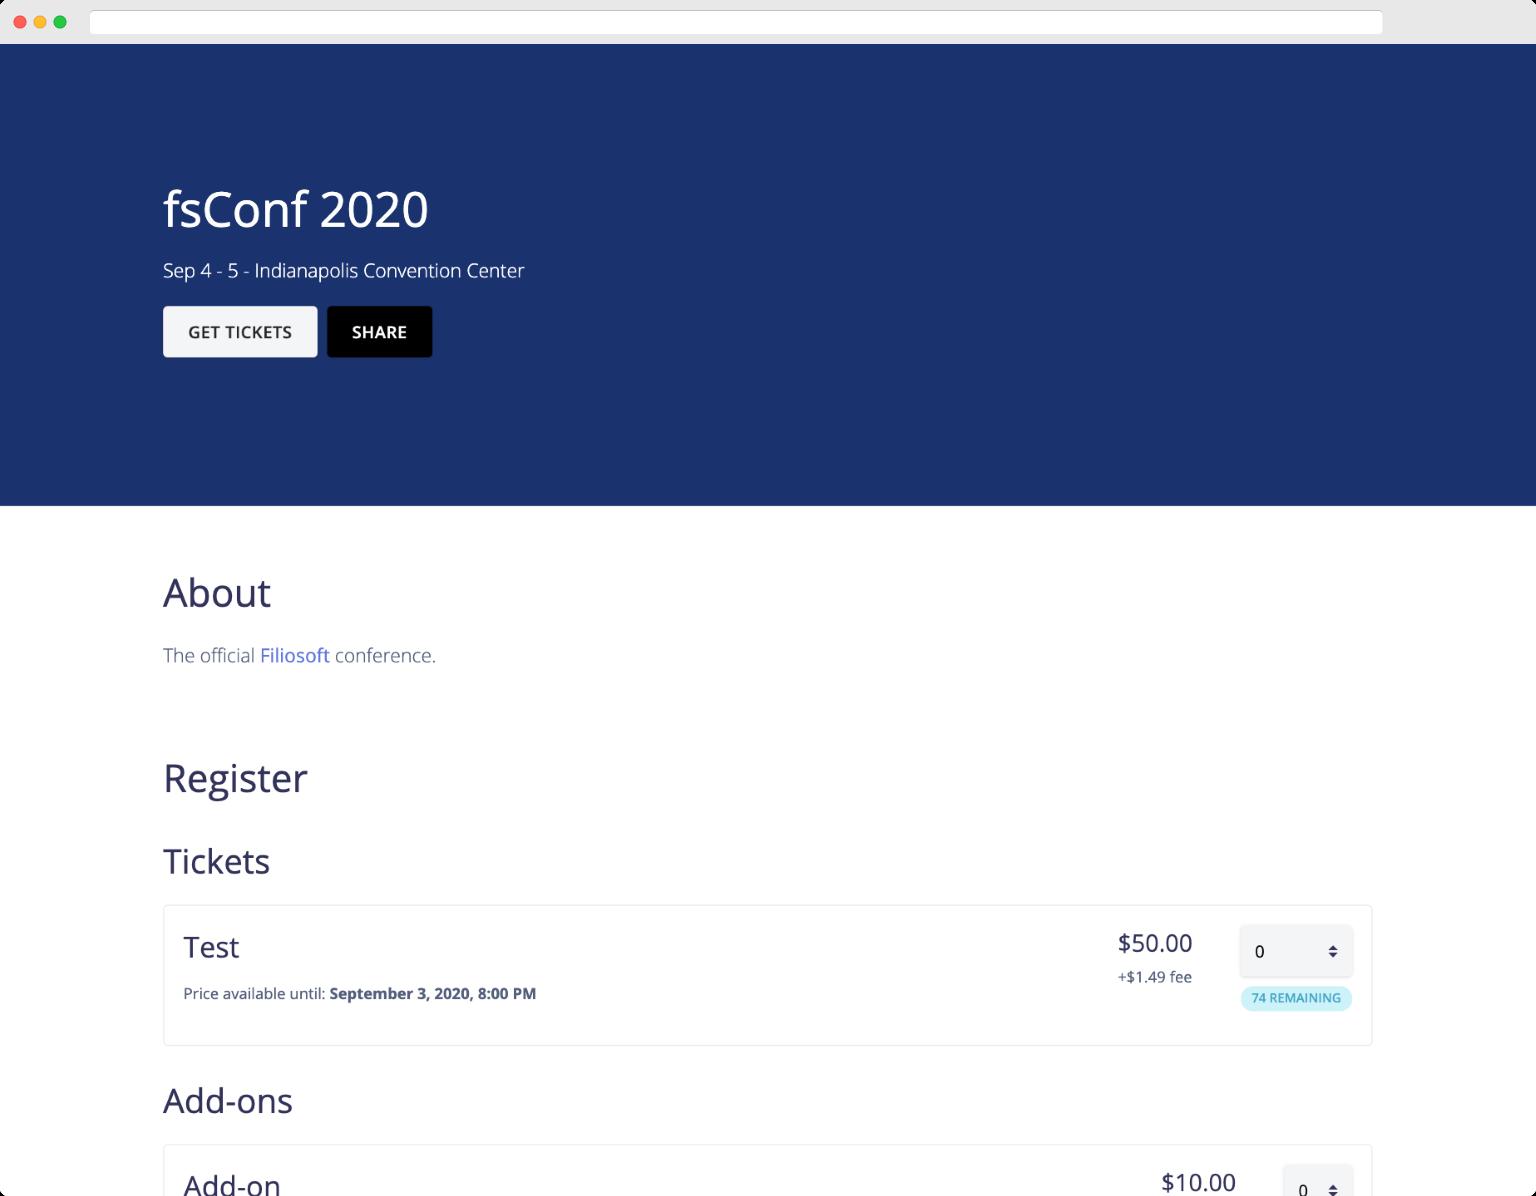 Registration page screenshot